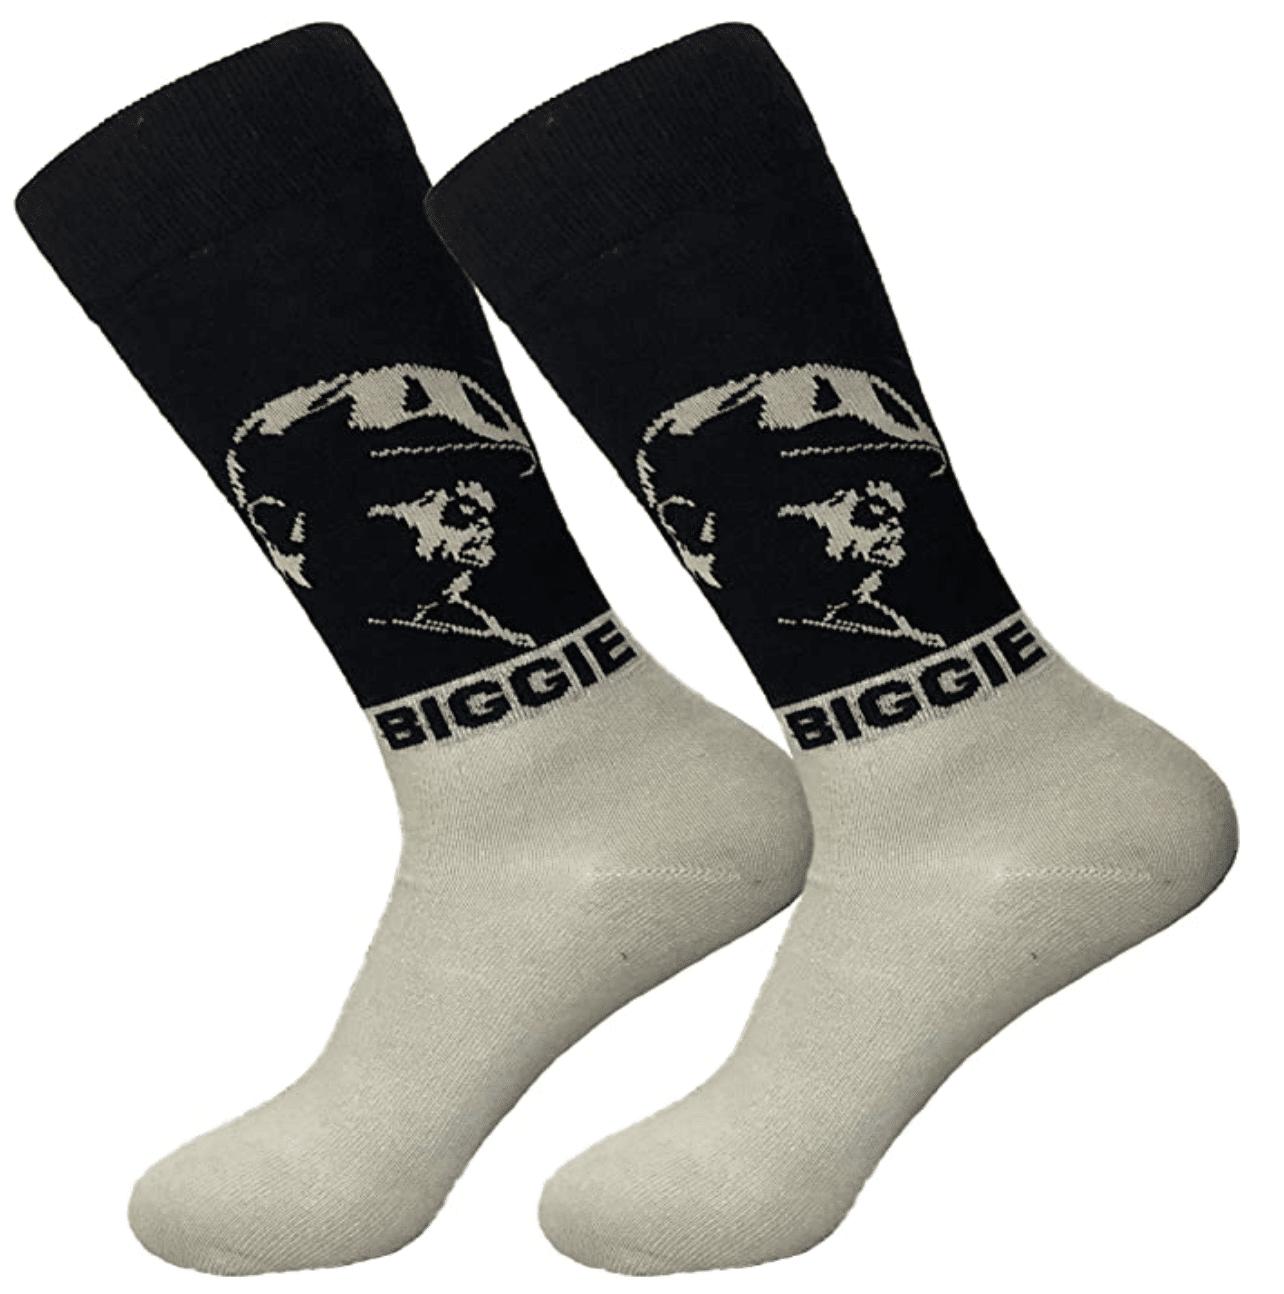 stocking-stuffers-ideas-for-men-biggie-socks